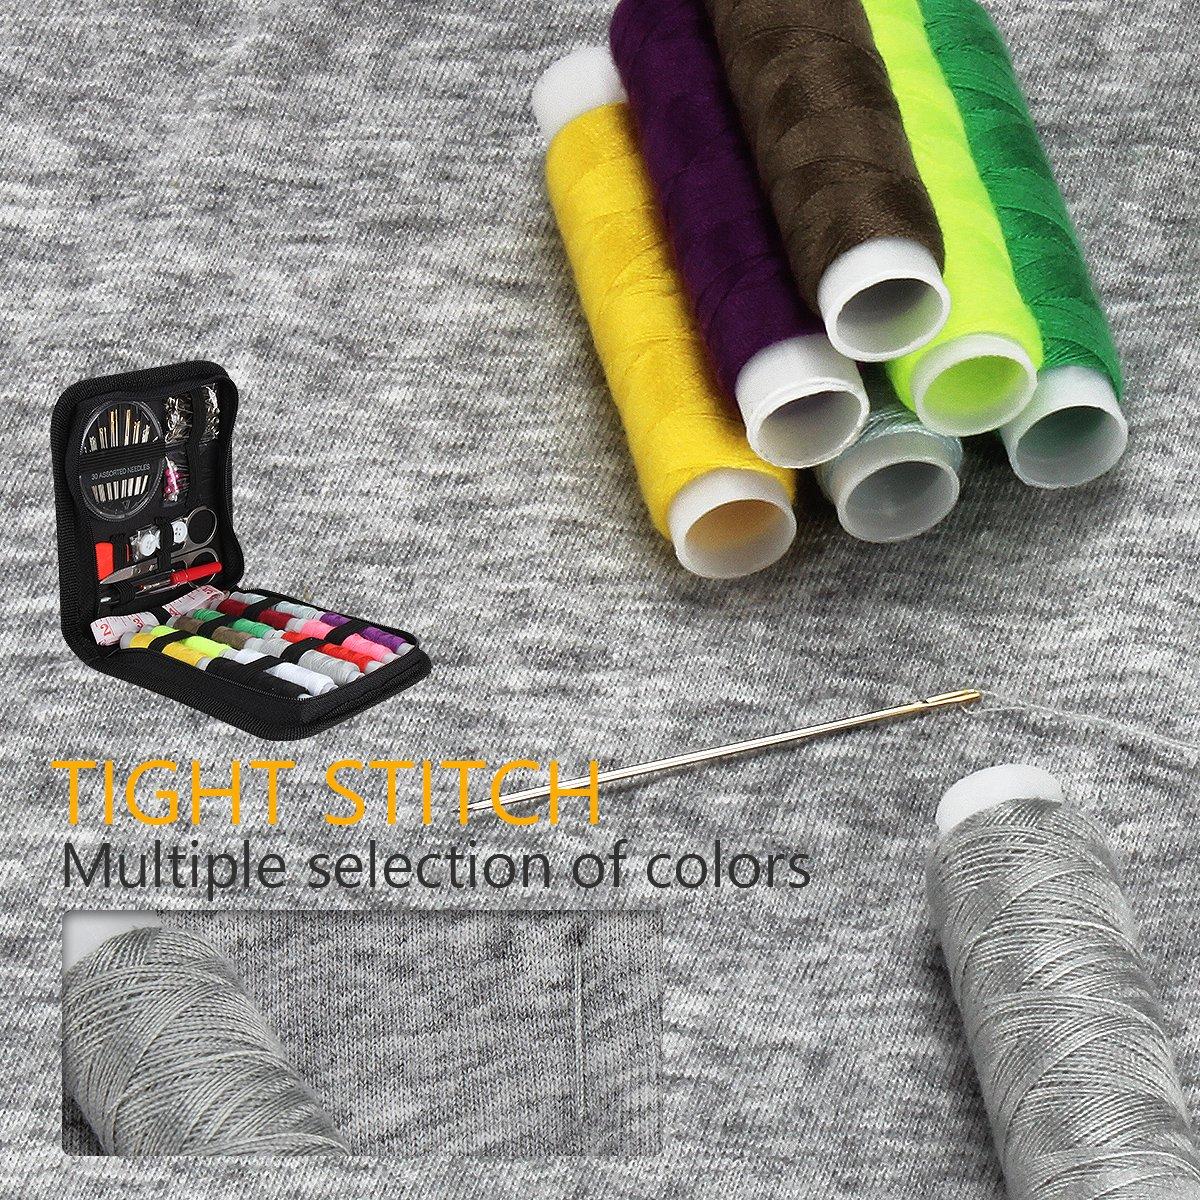 JUNING Kit de costura Accesorios de costura 73PCS, 12 carretes de hilo - Kit de costura premium de formato grande 50m con bolsa de transporte